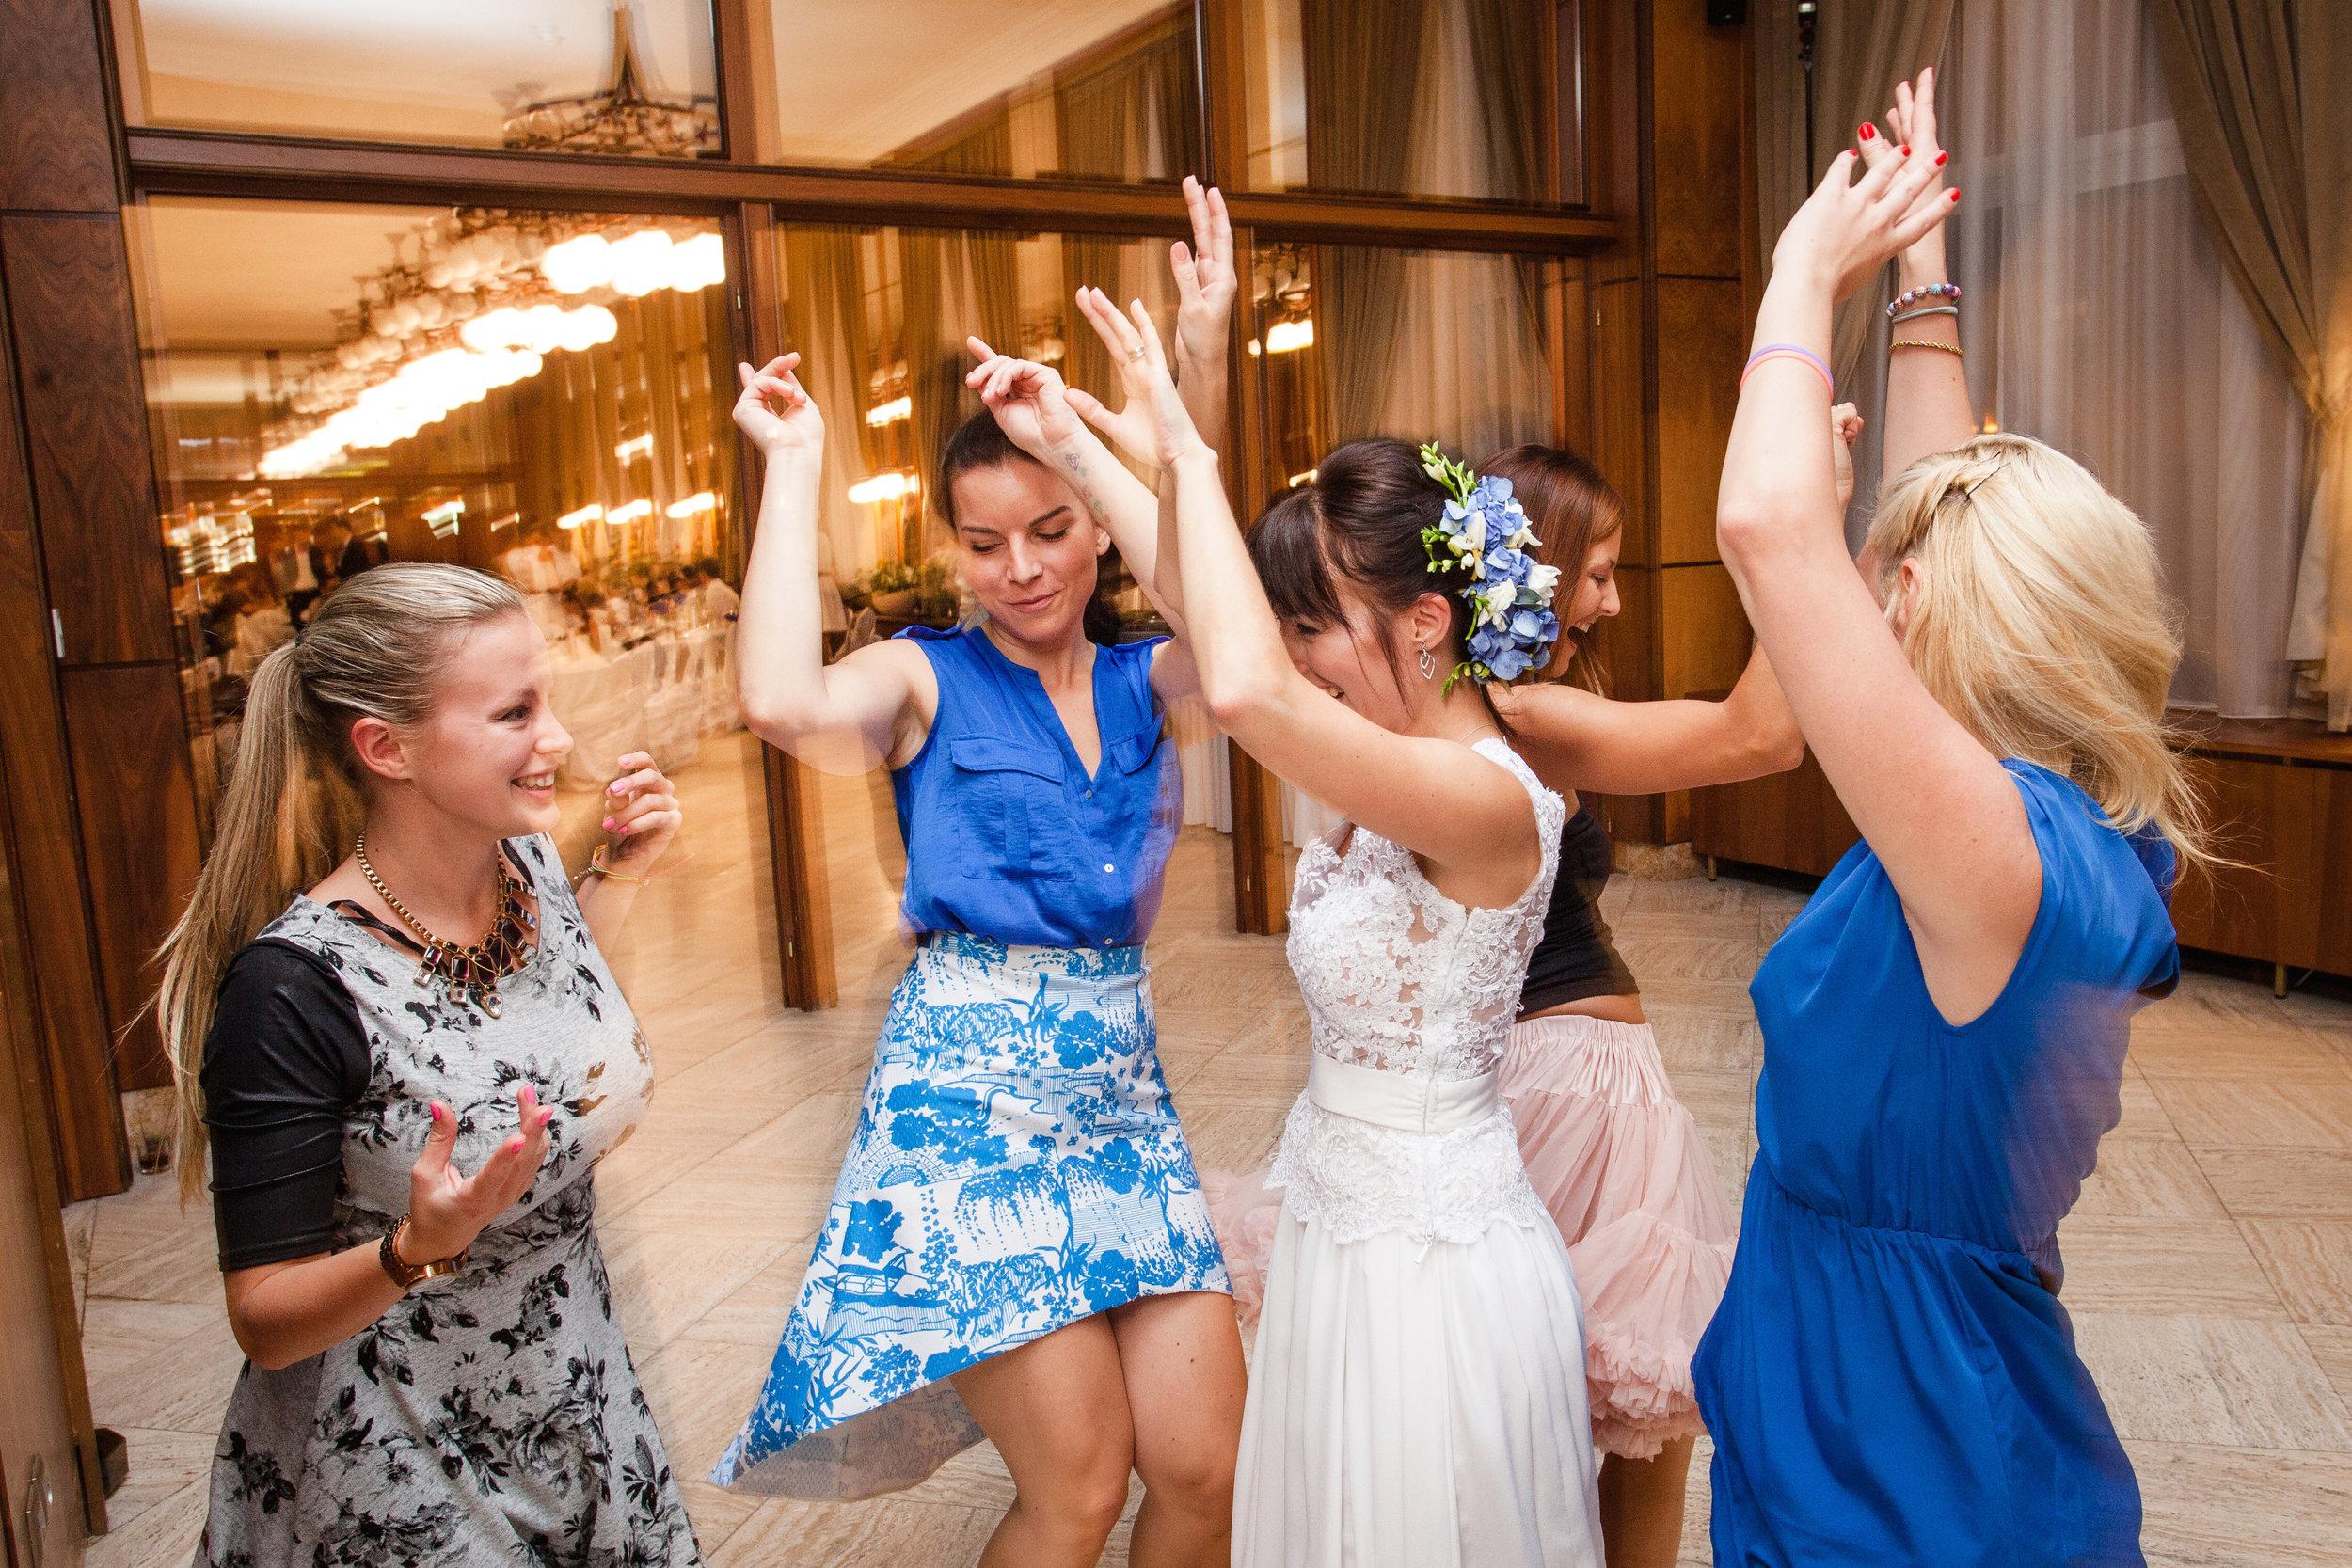 destination-wedding-photographer-slovakia-bratislava-reception-dancing-5.jpg